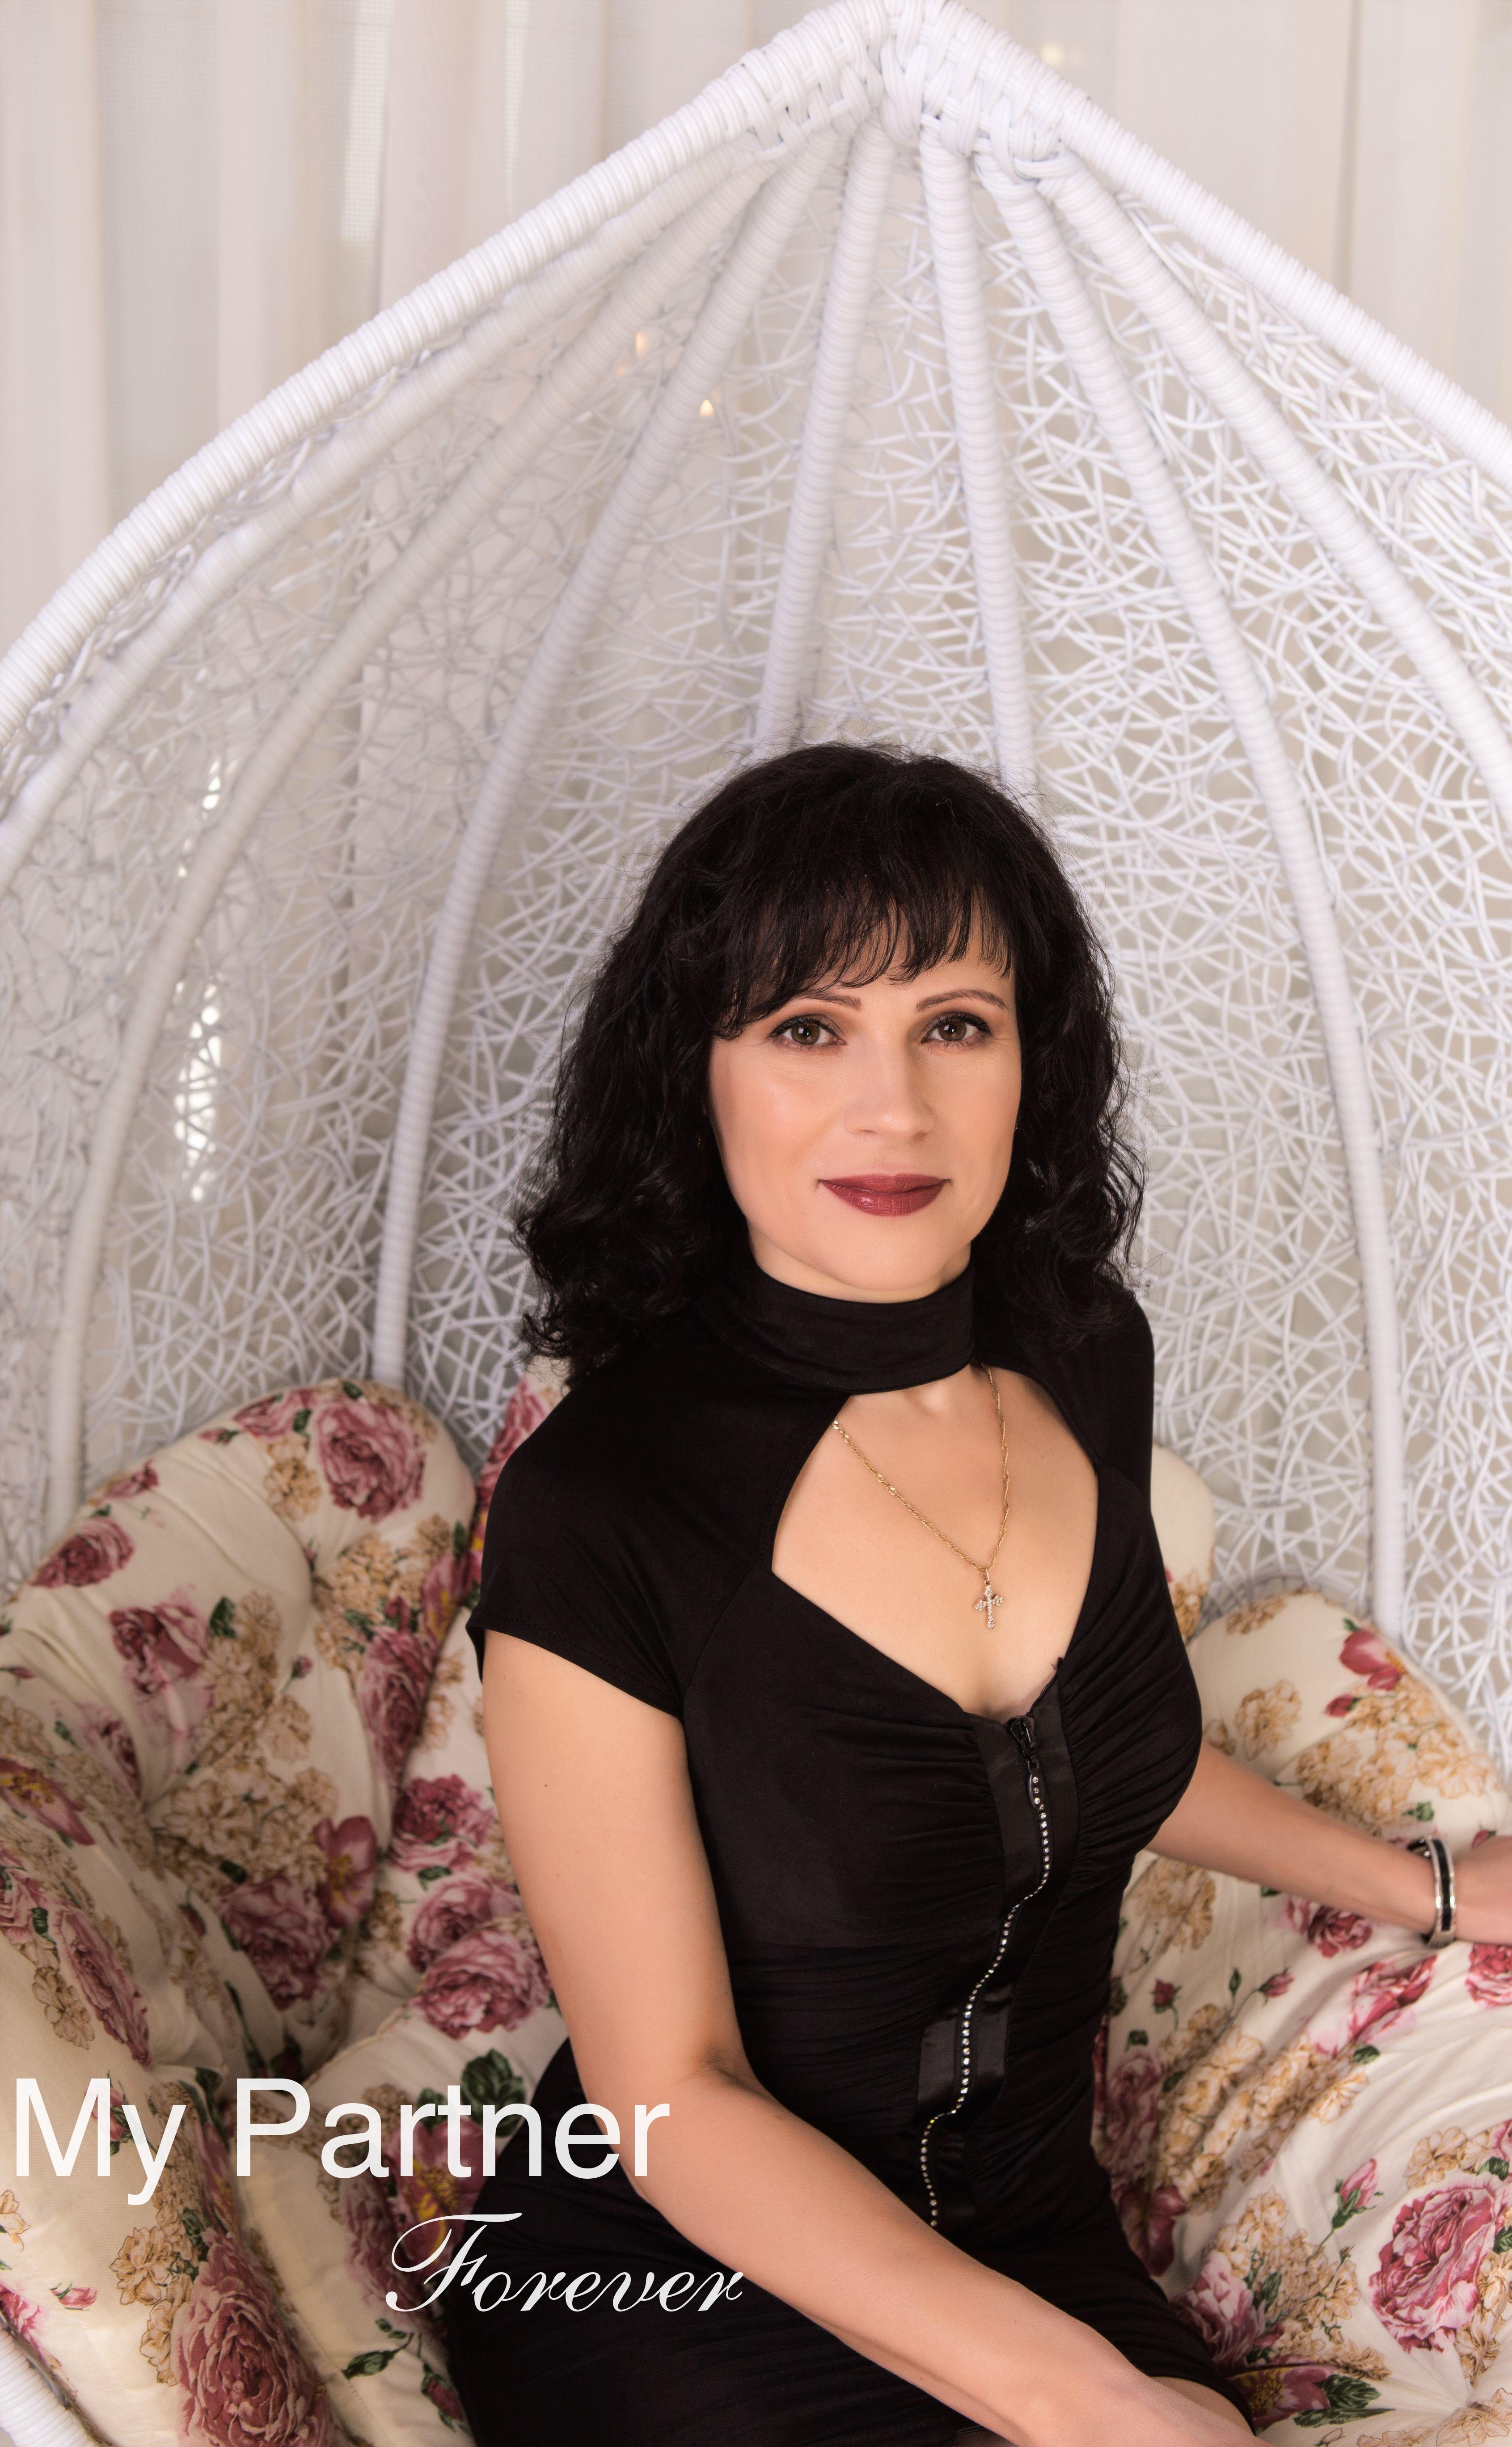 Quicklist 57 Single Ukrainian Women